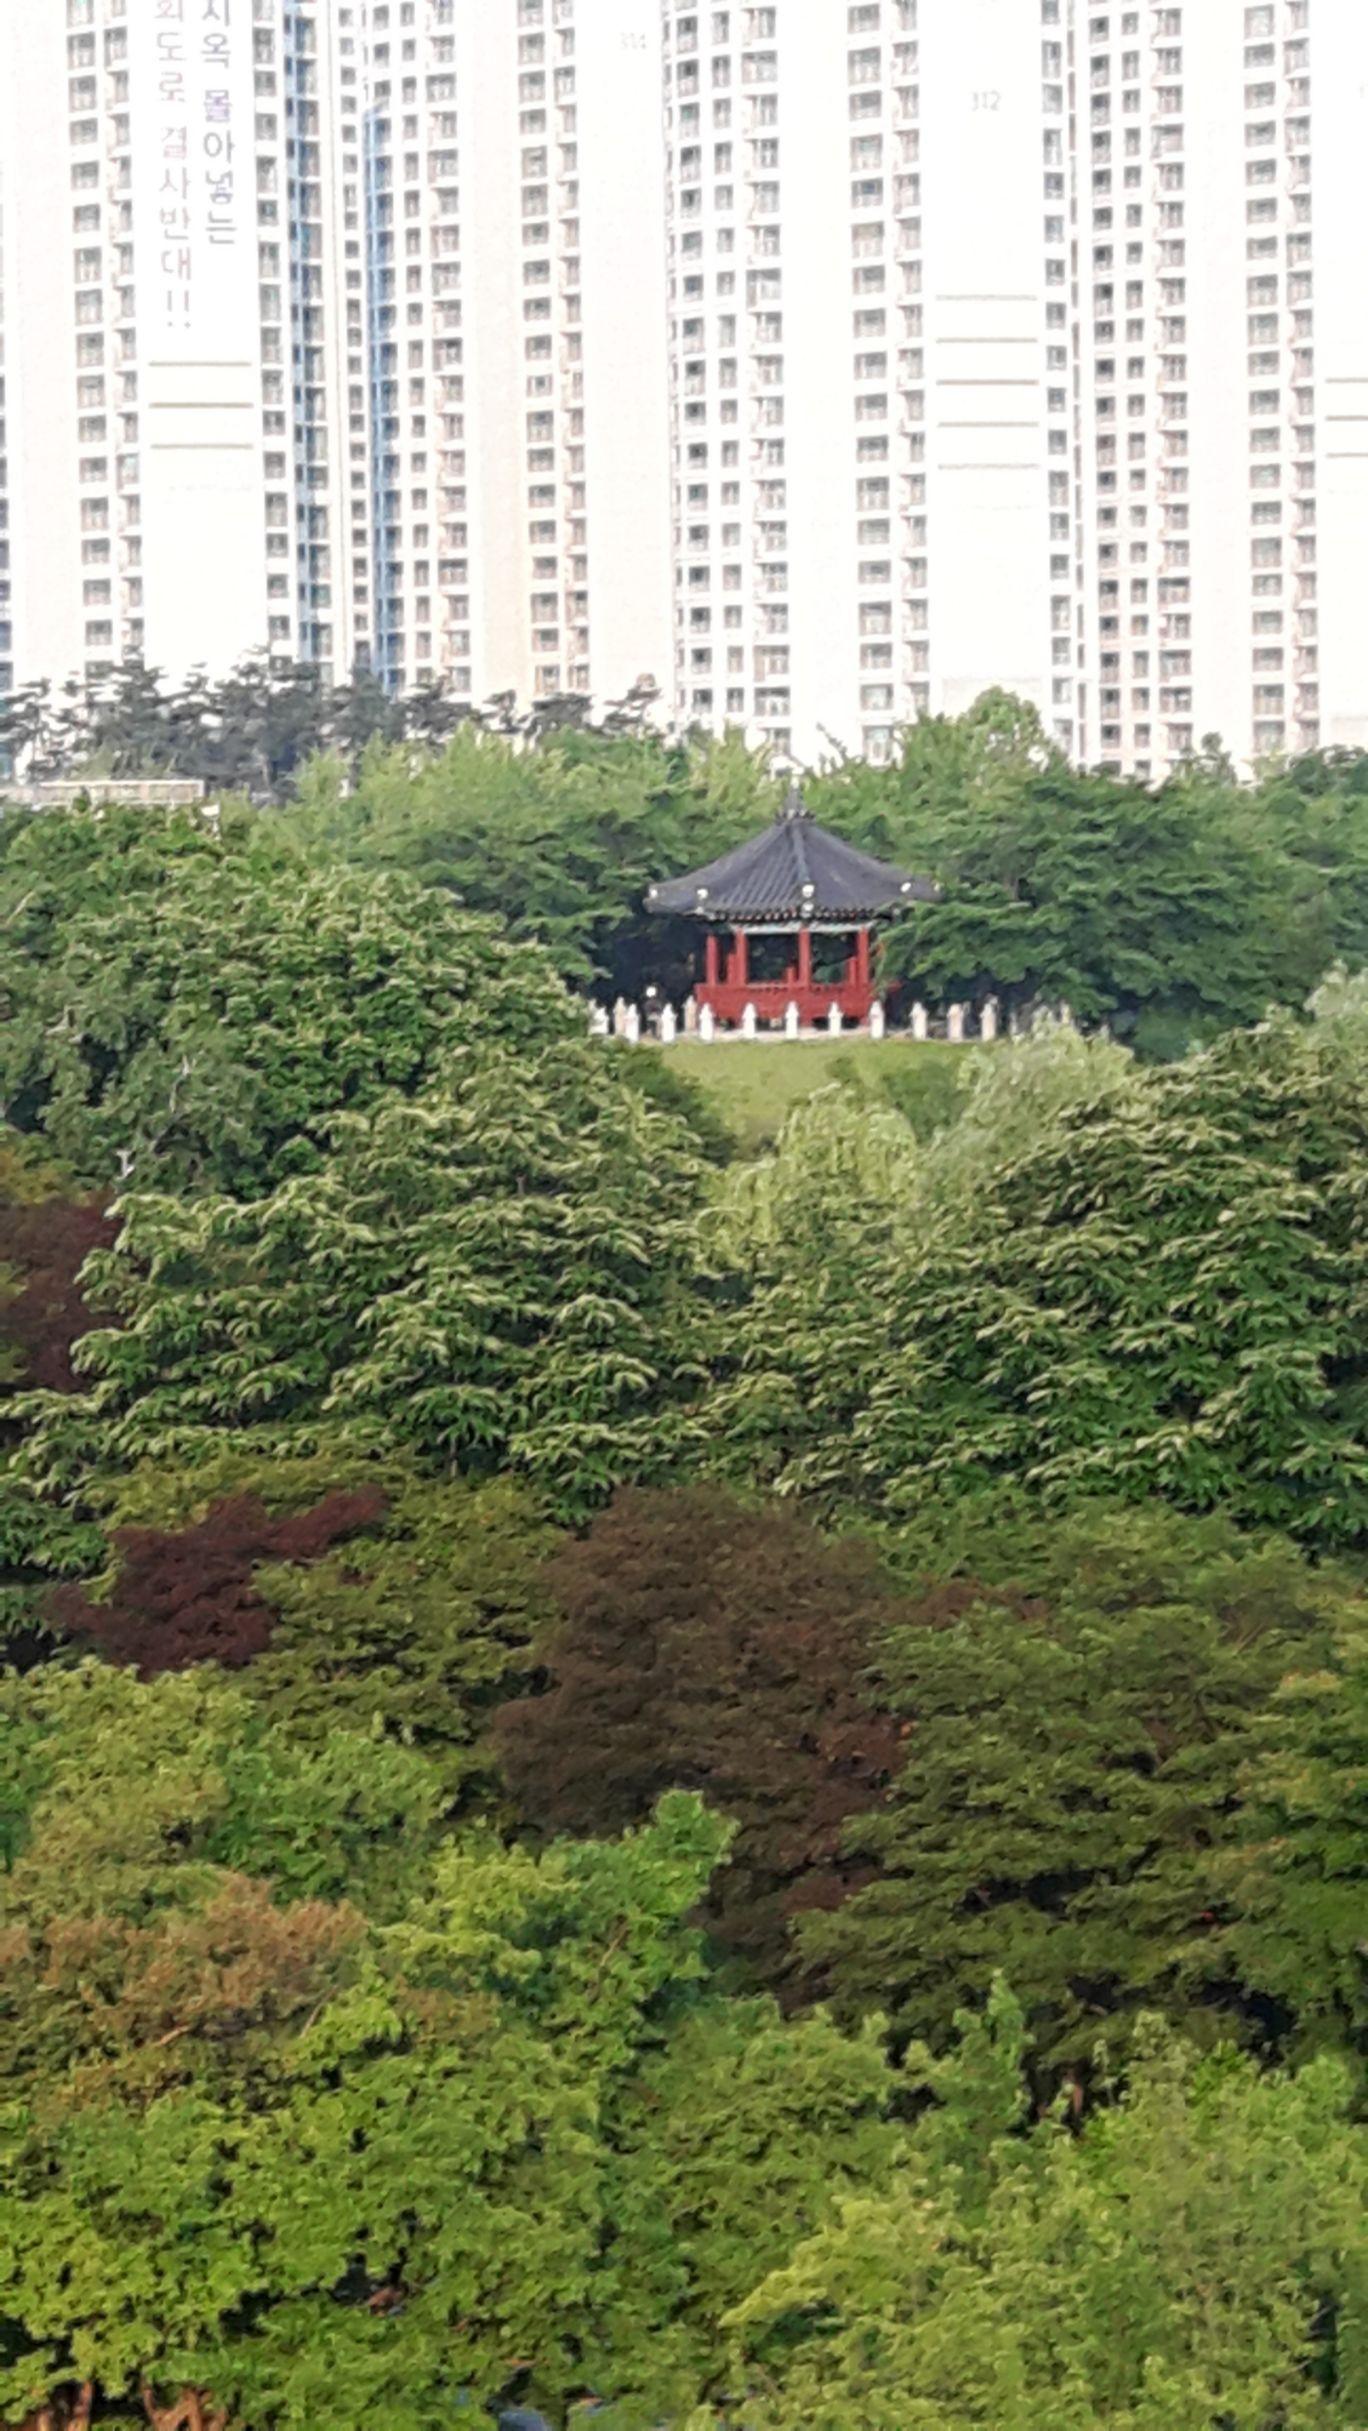 Photo of Seoul By gypsy trail